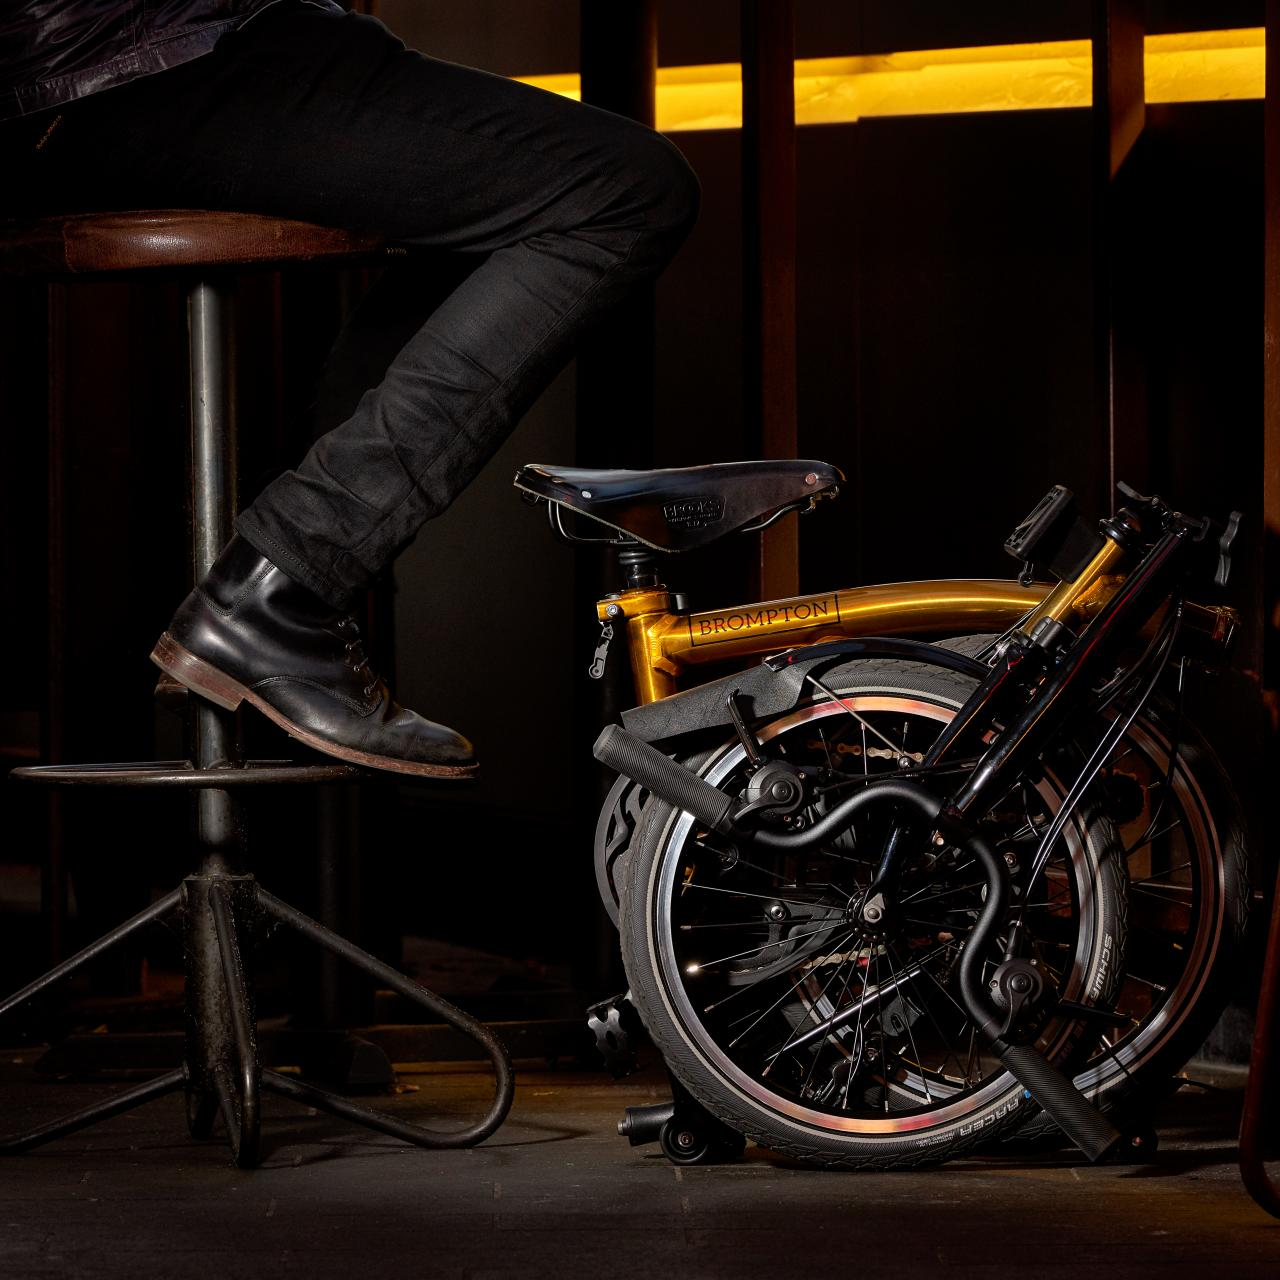 Brompton Bicycle 為慶祝登陸亞洲 20 年,特別推出 「20 Years in Asia Gold Edition」摺合單車,獨家為亞洲地區而設。